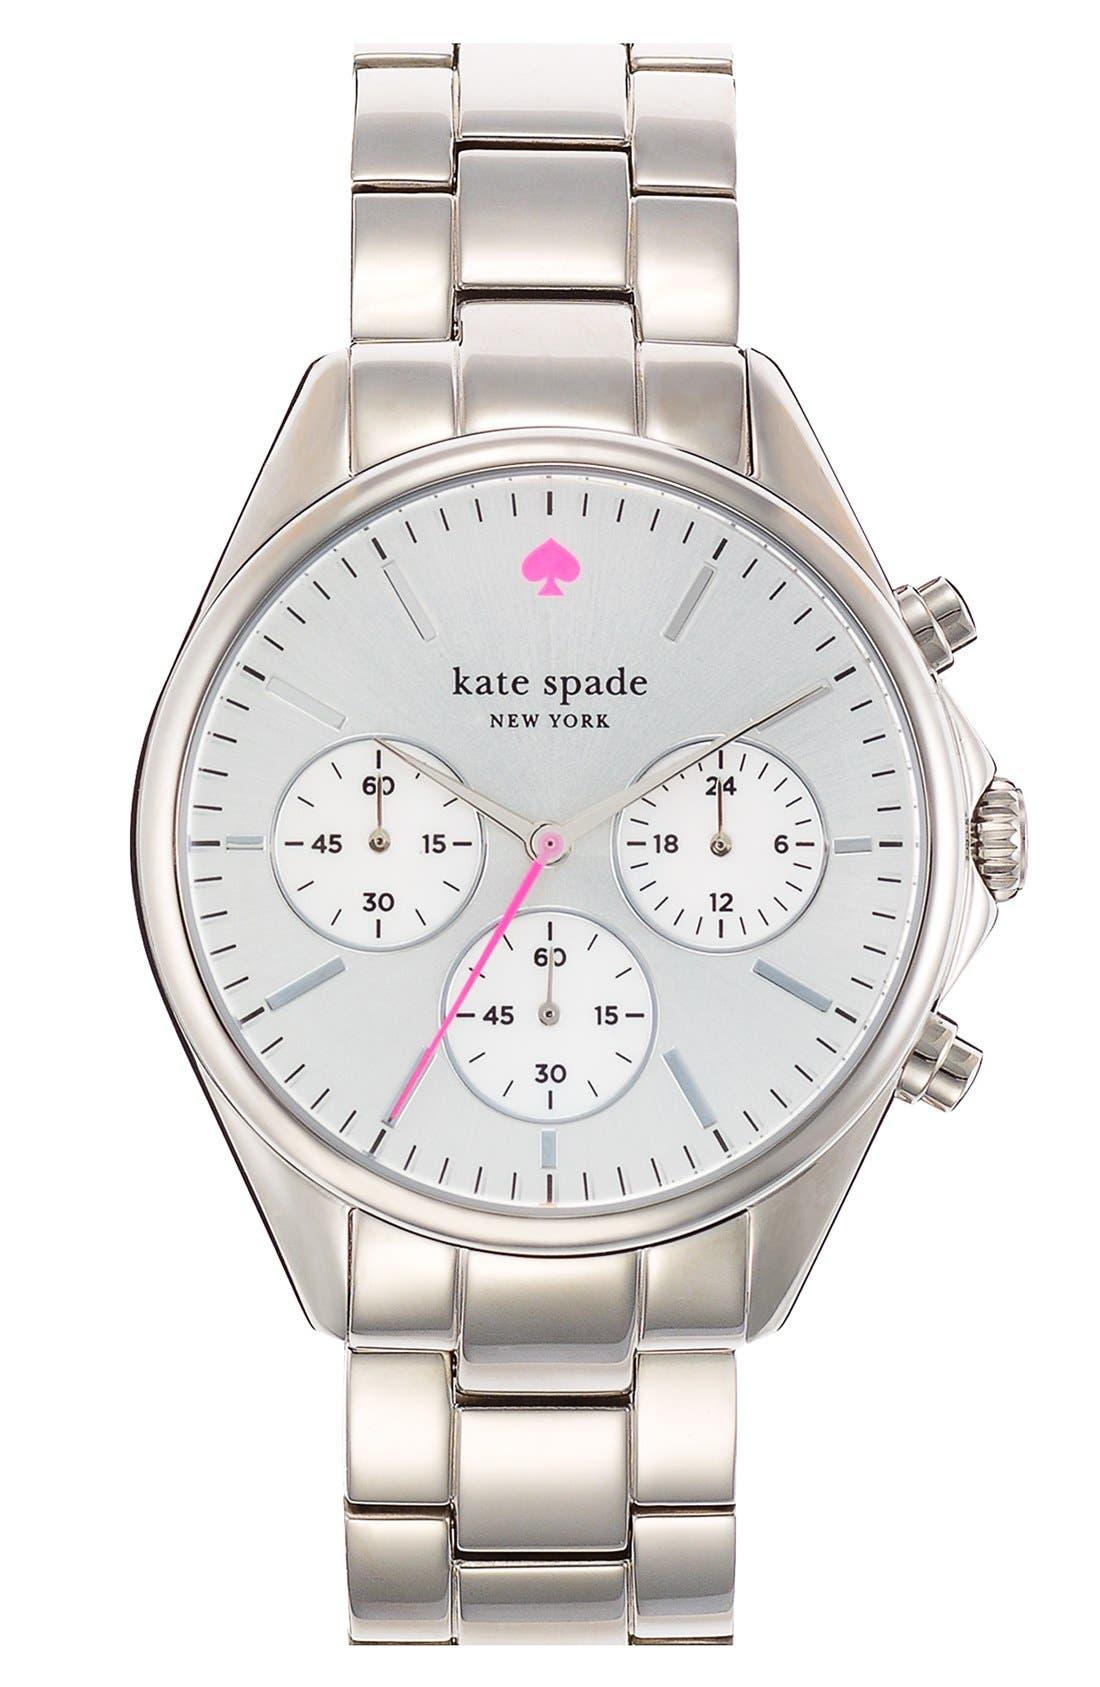 Main Image - kate spade new york 'seaport' chronograph bracelet watch, 38mm